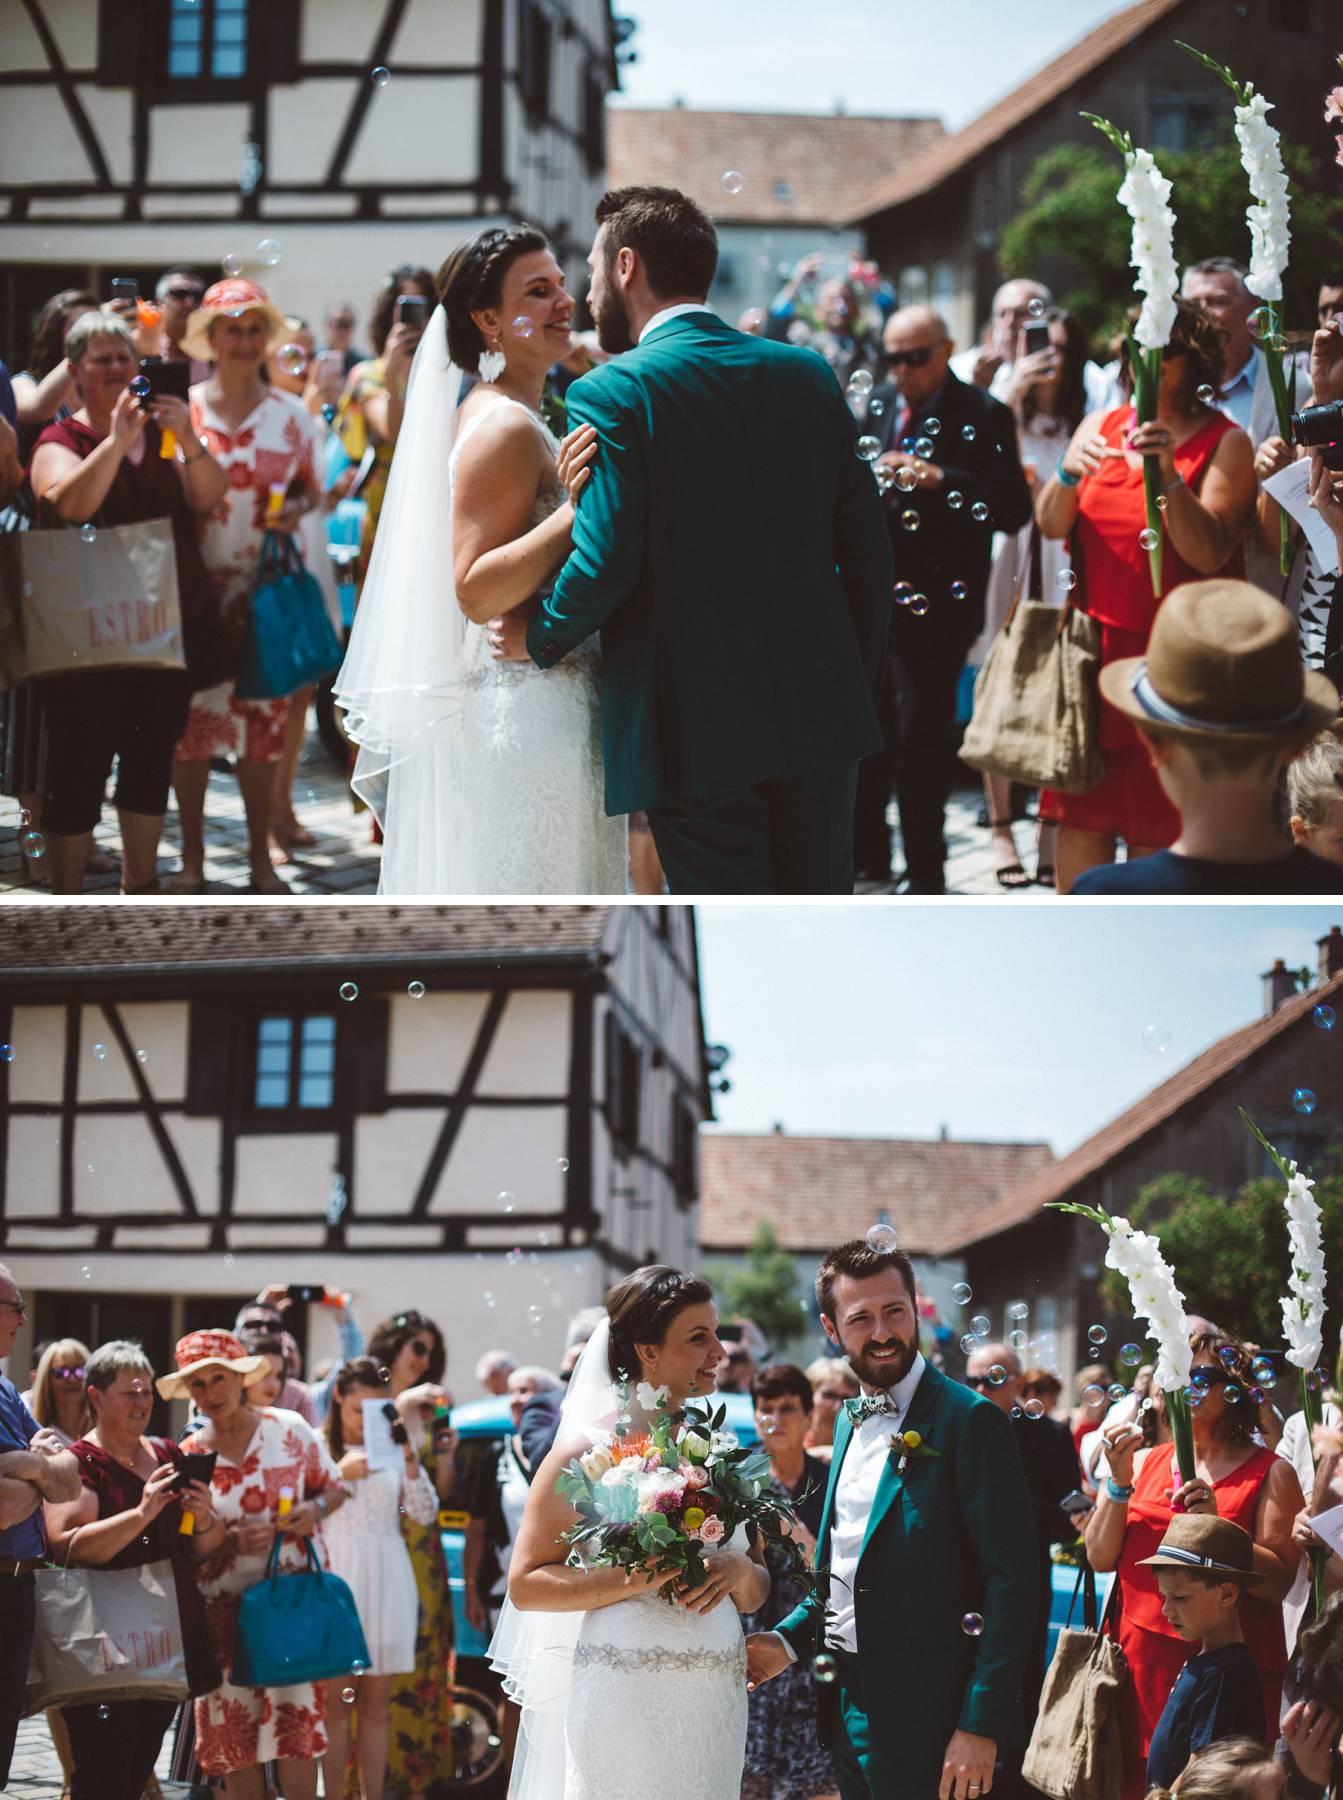 mariage-tropical-raben-horben_0014.jpg